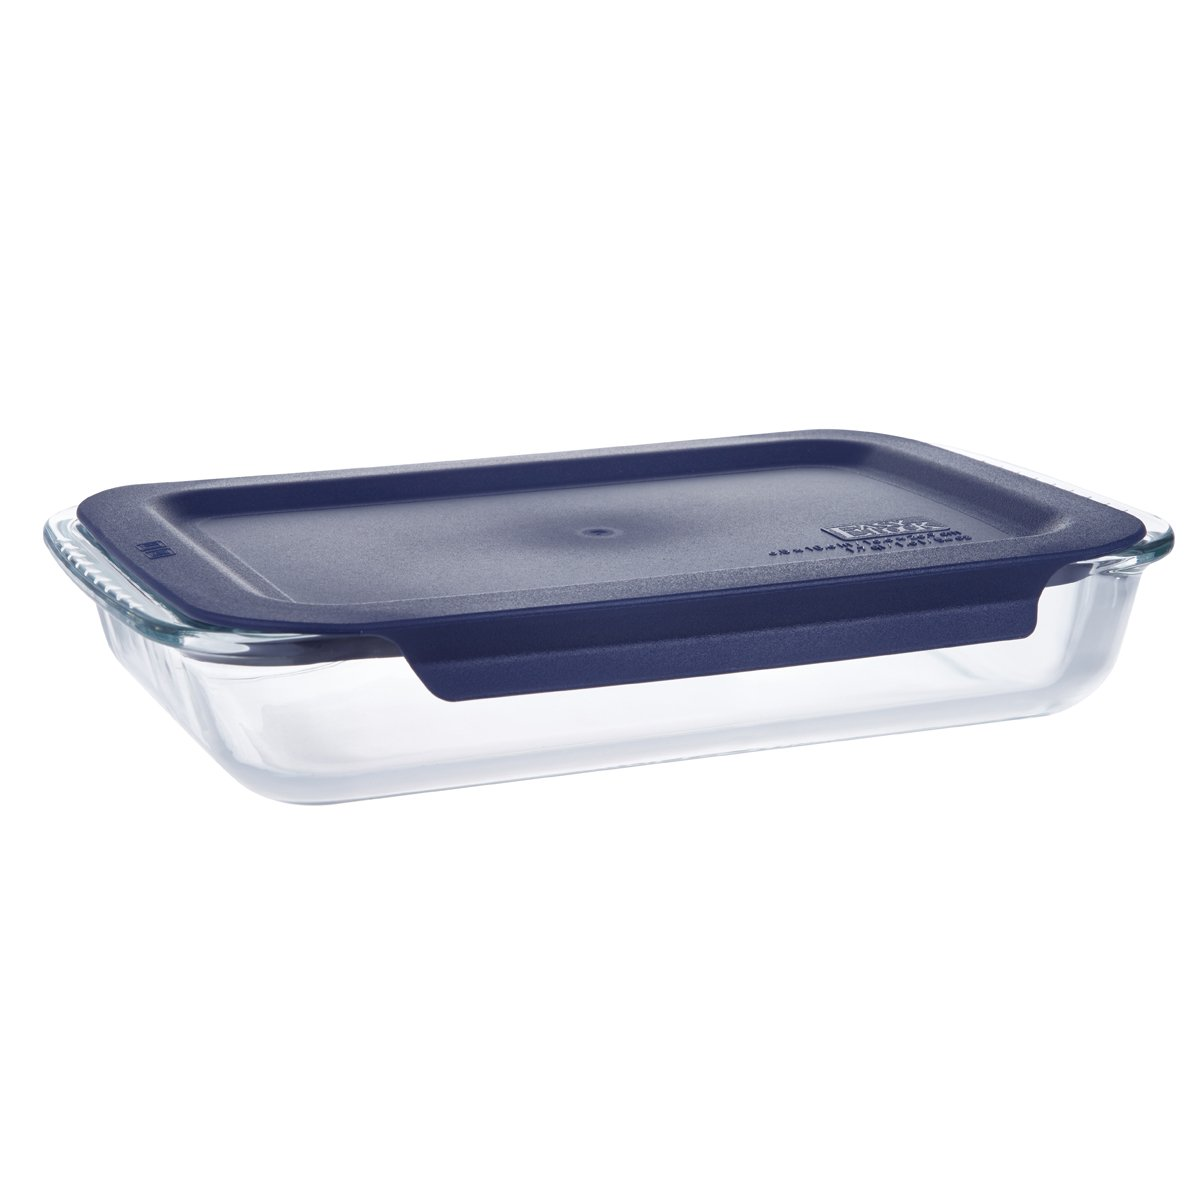 LEXINGWARE 1.5 Quart Glass Bakeware Ovenware Oblong Baking Dish Blue Plastic Lid - 7.7 x 12 inch